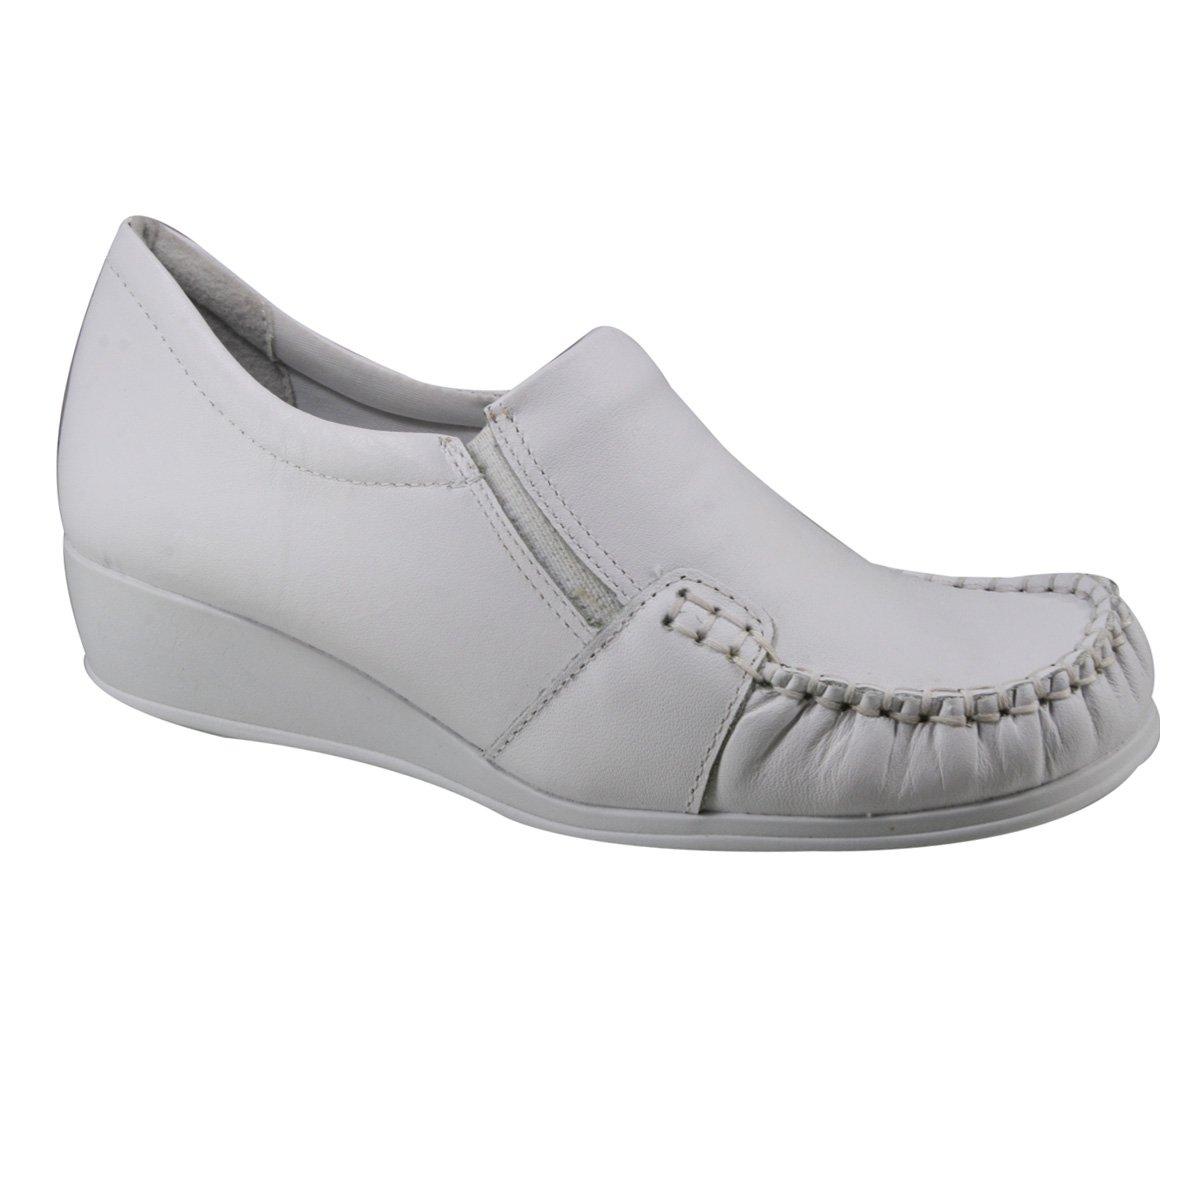 df0d5c329 Sapato Anabela Comfortflex 17-93303 - Branco (Napa Vestuário ...